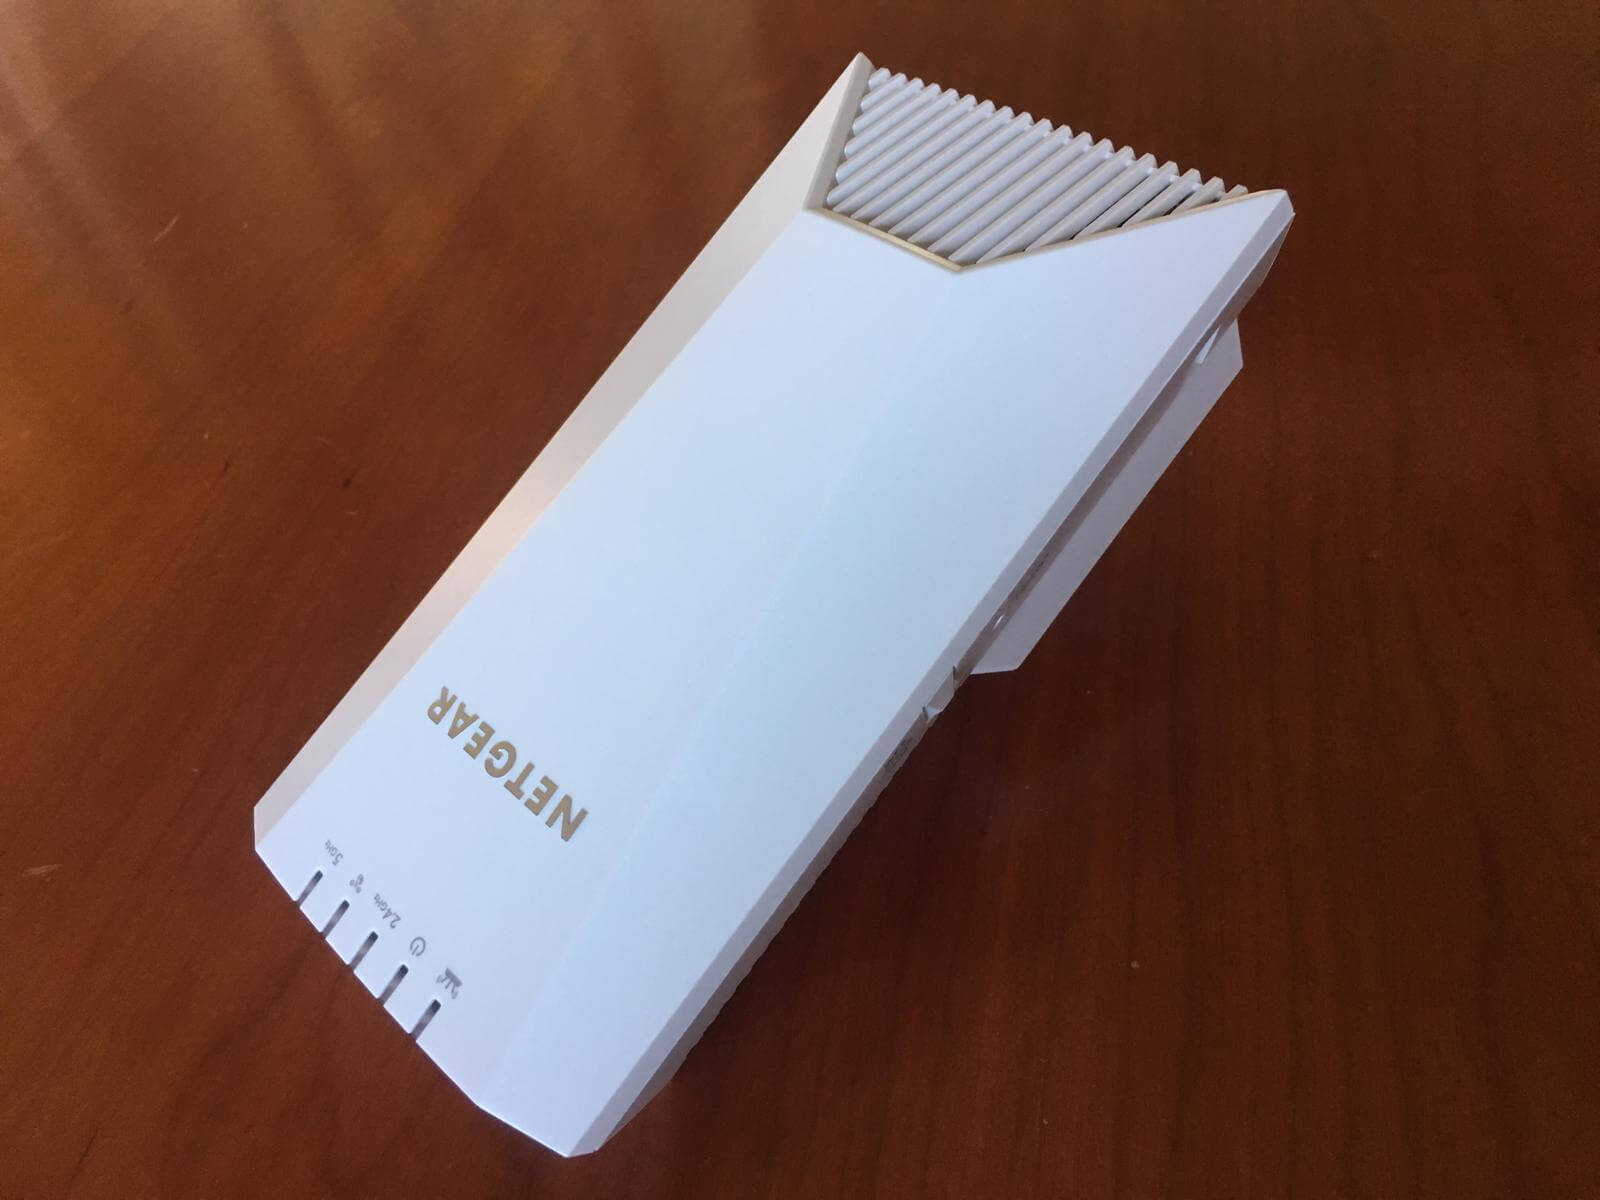 Recensione Netgear Nighthawk X4S Wi-Fi extender 4